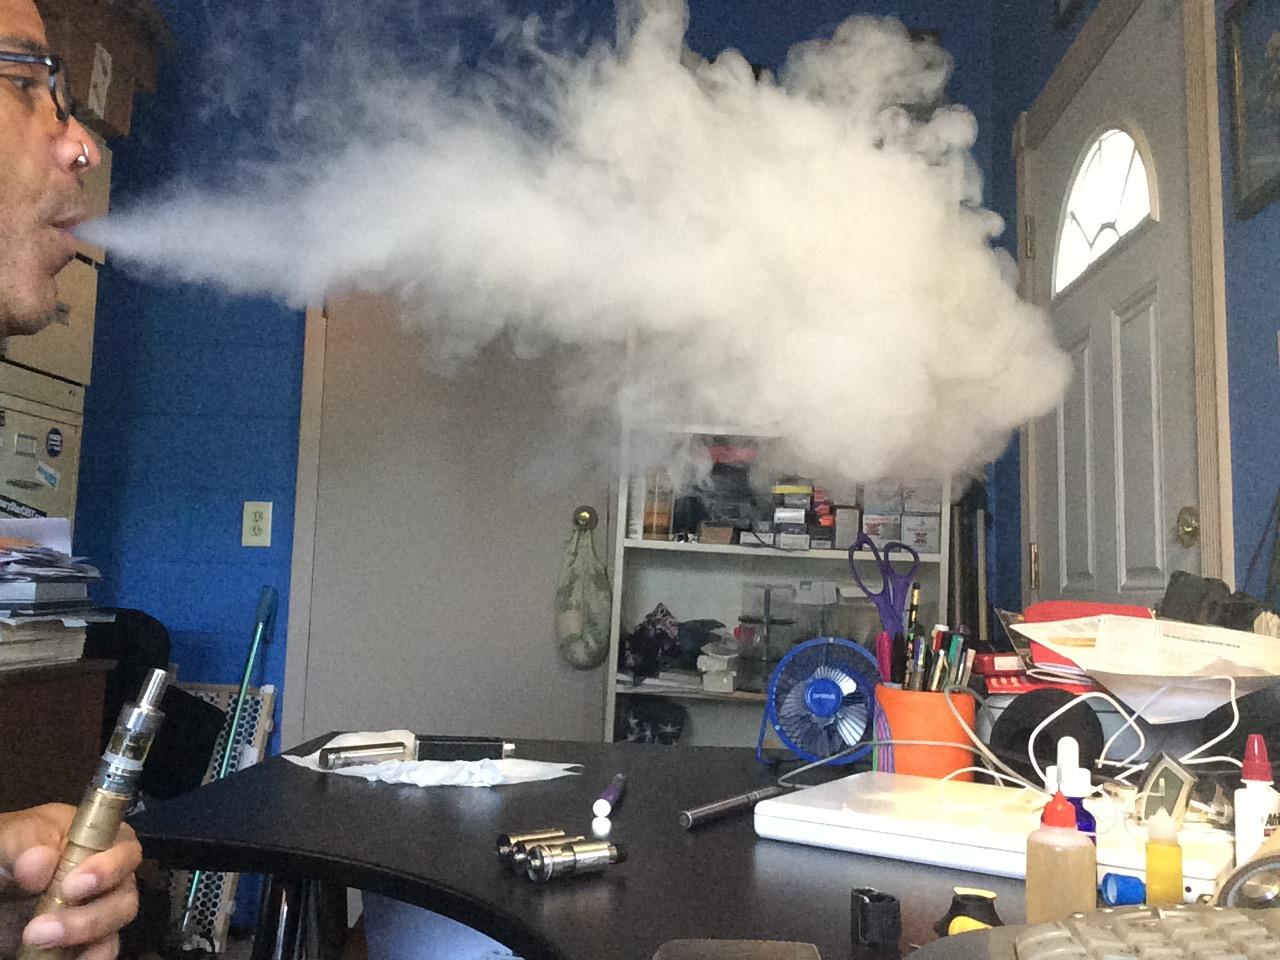 Chucking a cloud with the Aspire Atlantis sub-ohm atomizer.